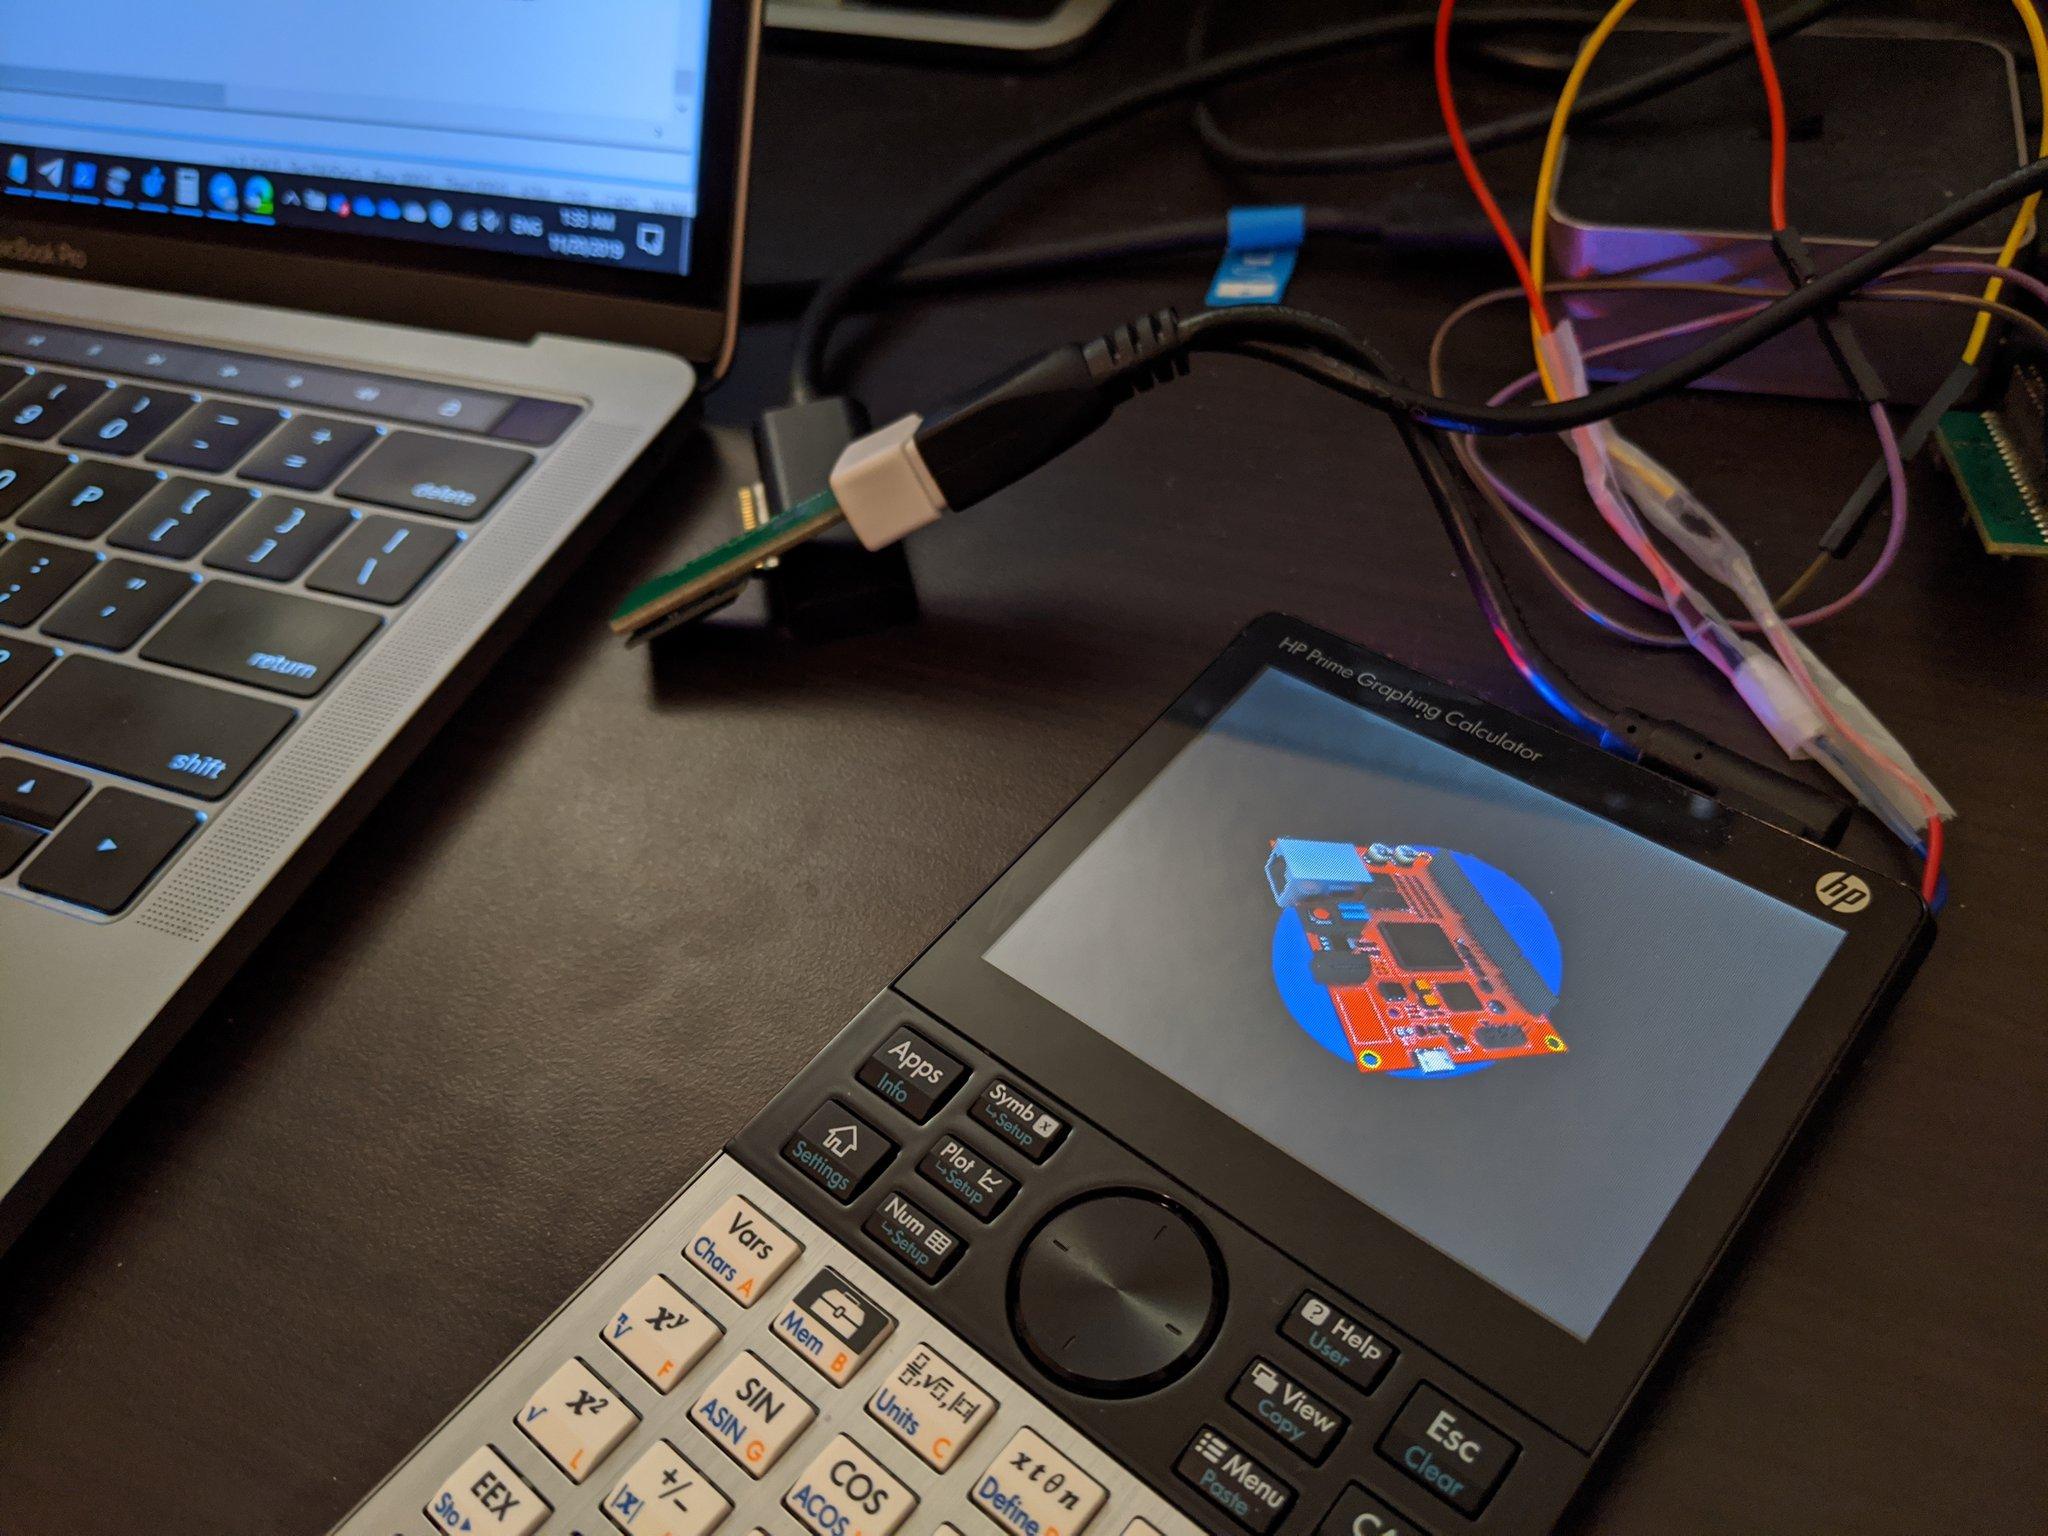 Windows IoT on HP Prime G2 Calculator